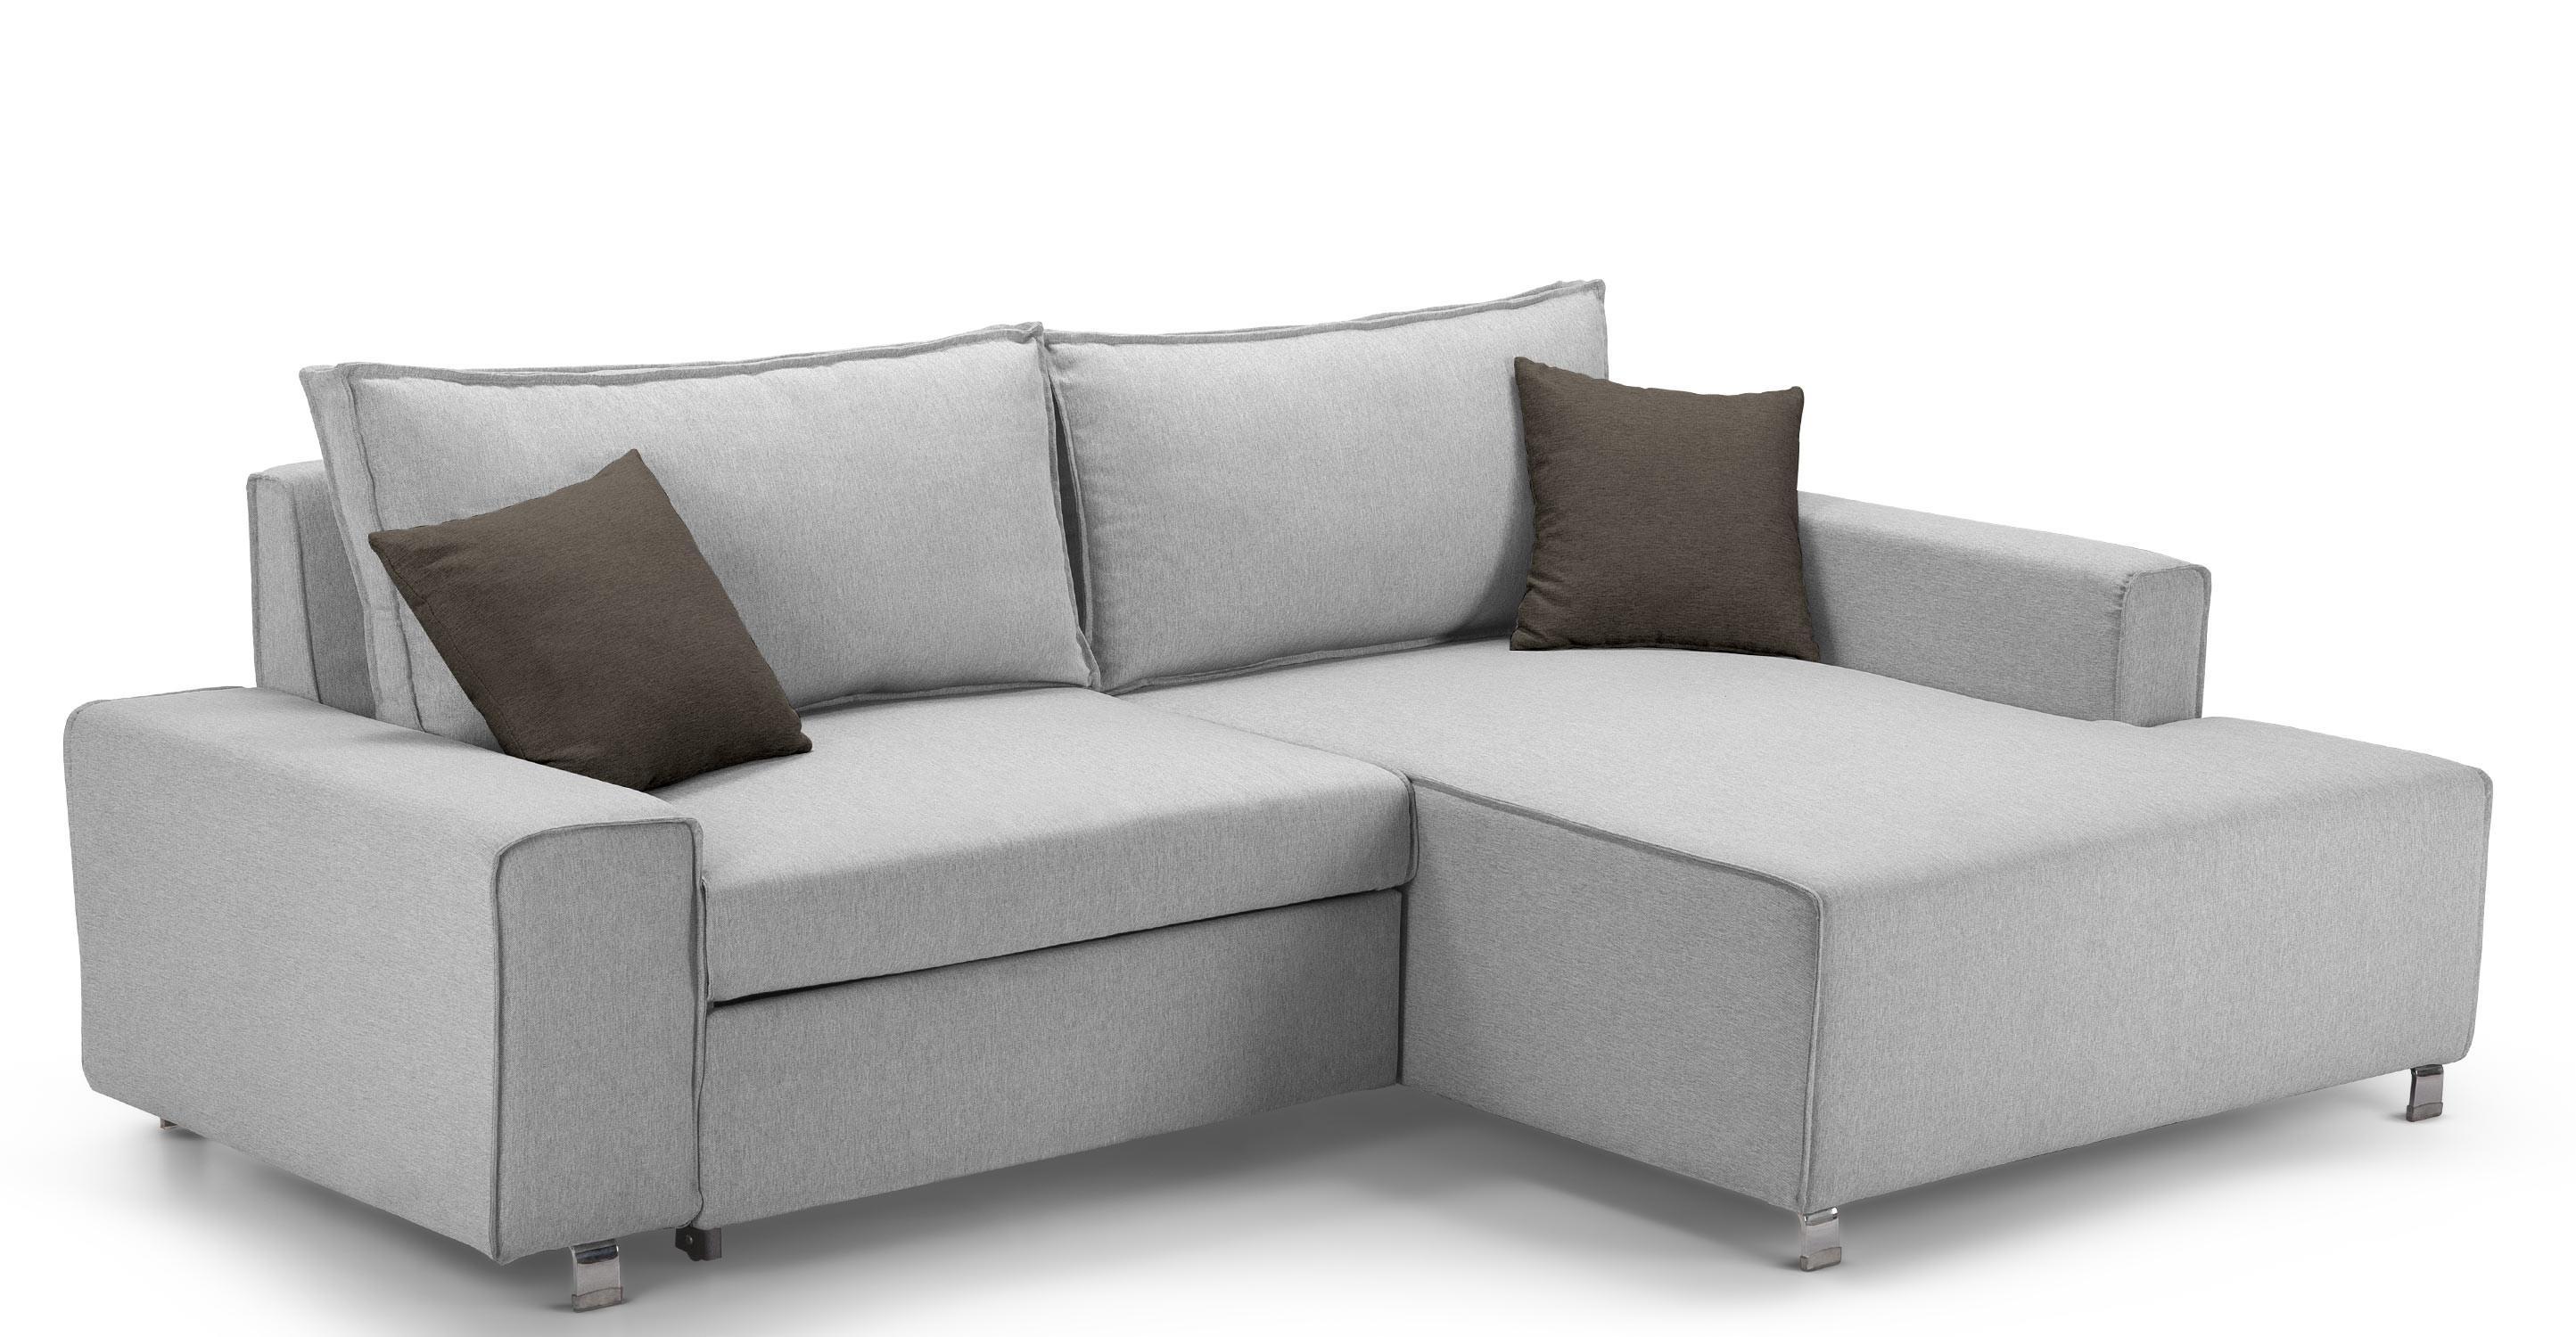 Sofas : Amazing Convertible Sofa Bed Cheap Sofa Beds Sofa Couch Regarding Sofa Corner Units (Image 20 of 24)